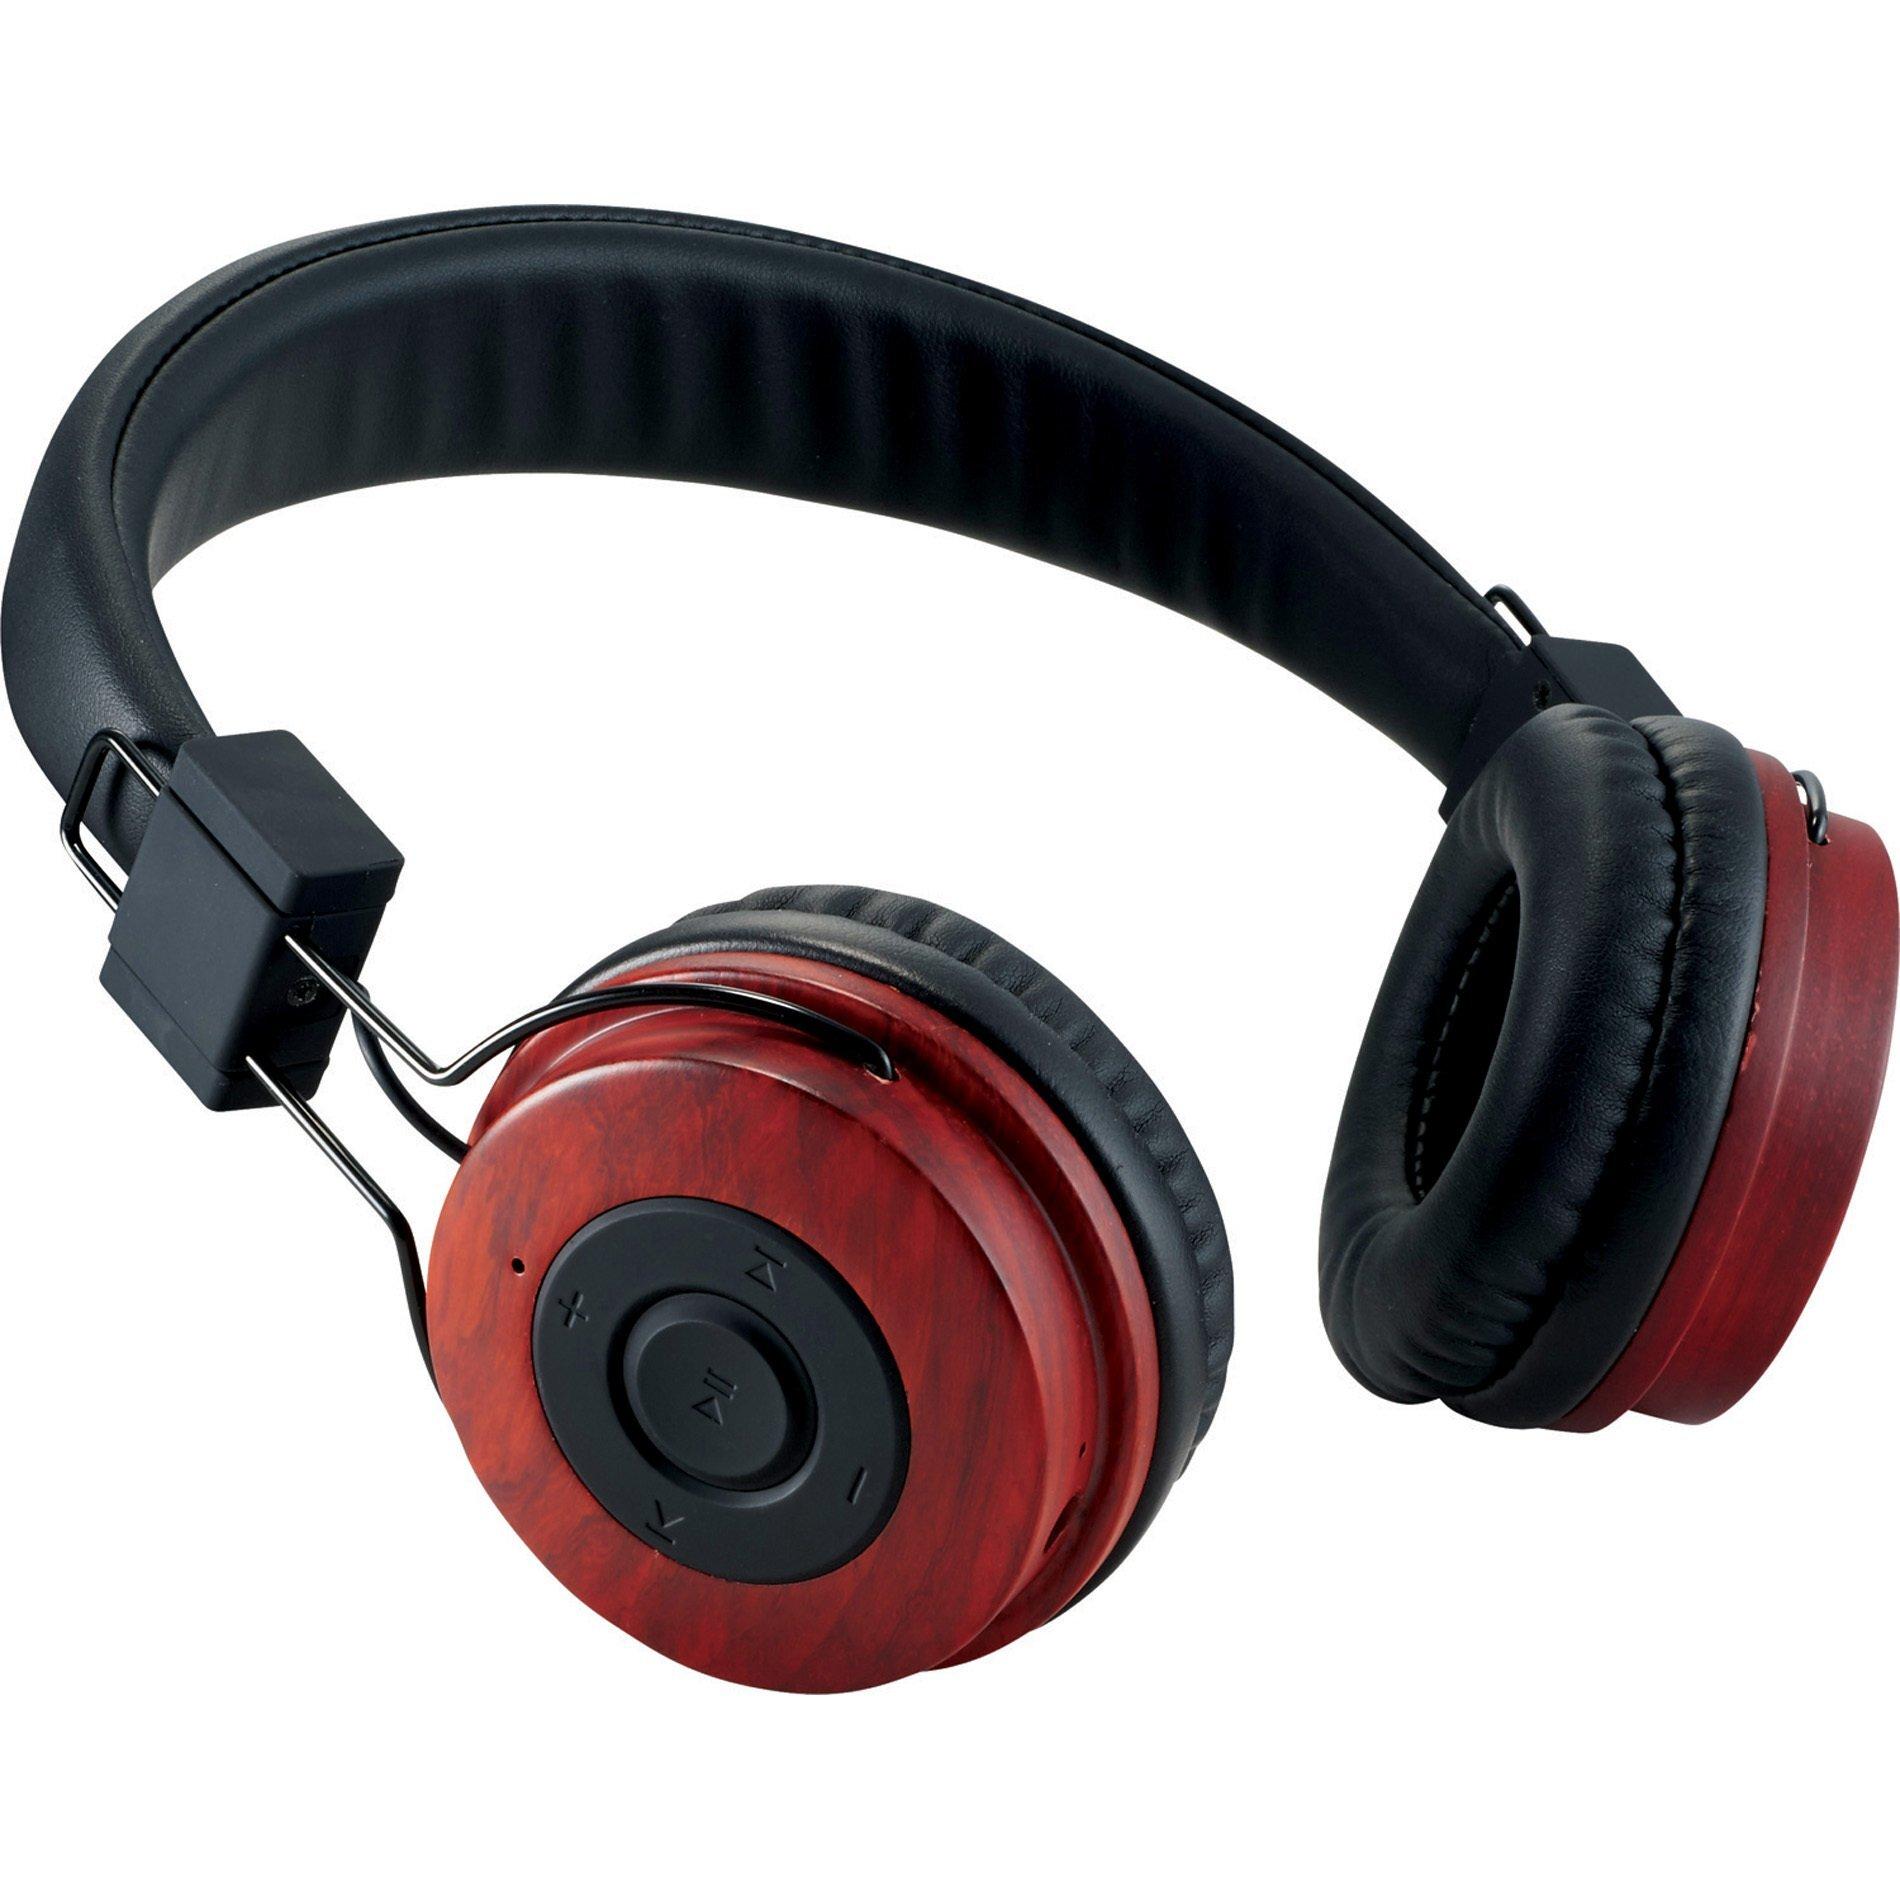 Mojave Wooden Bluetooth Headphones